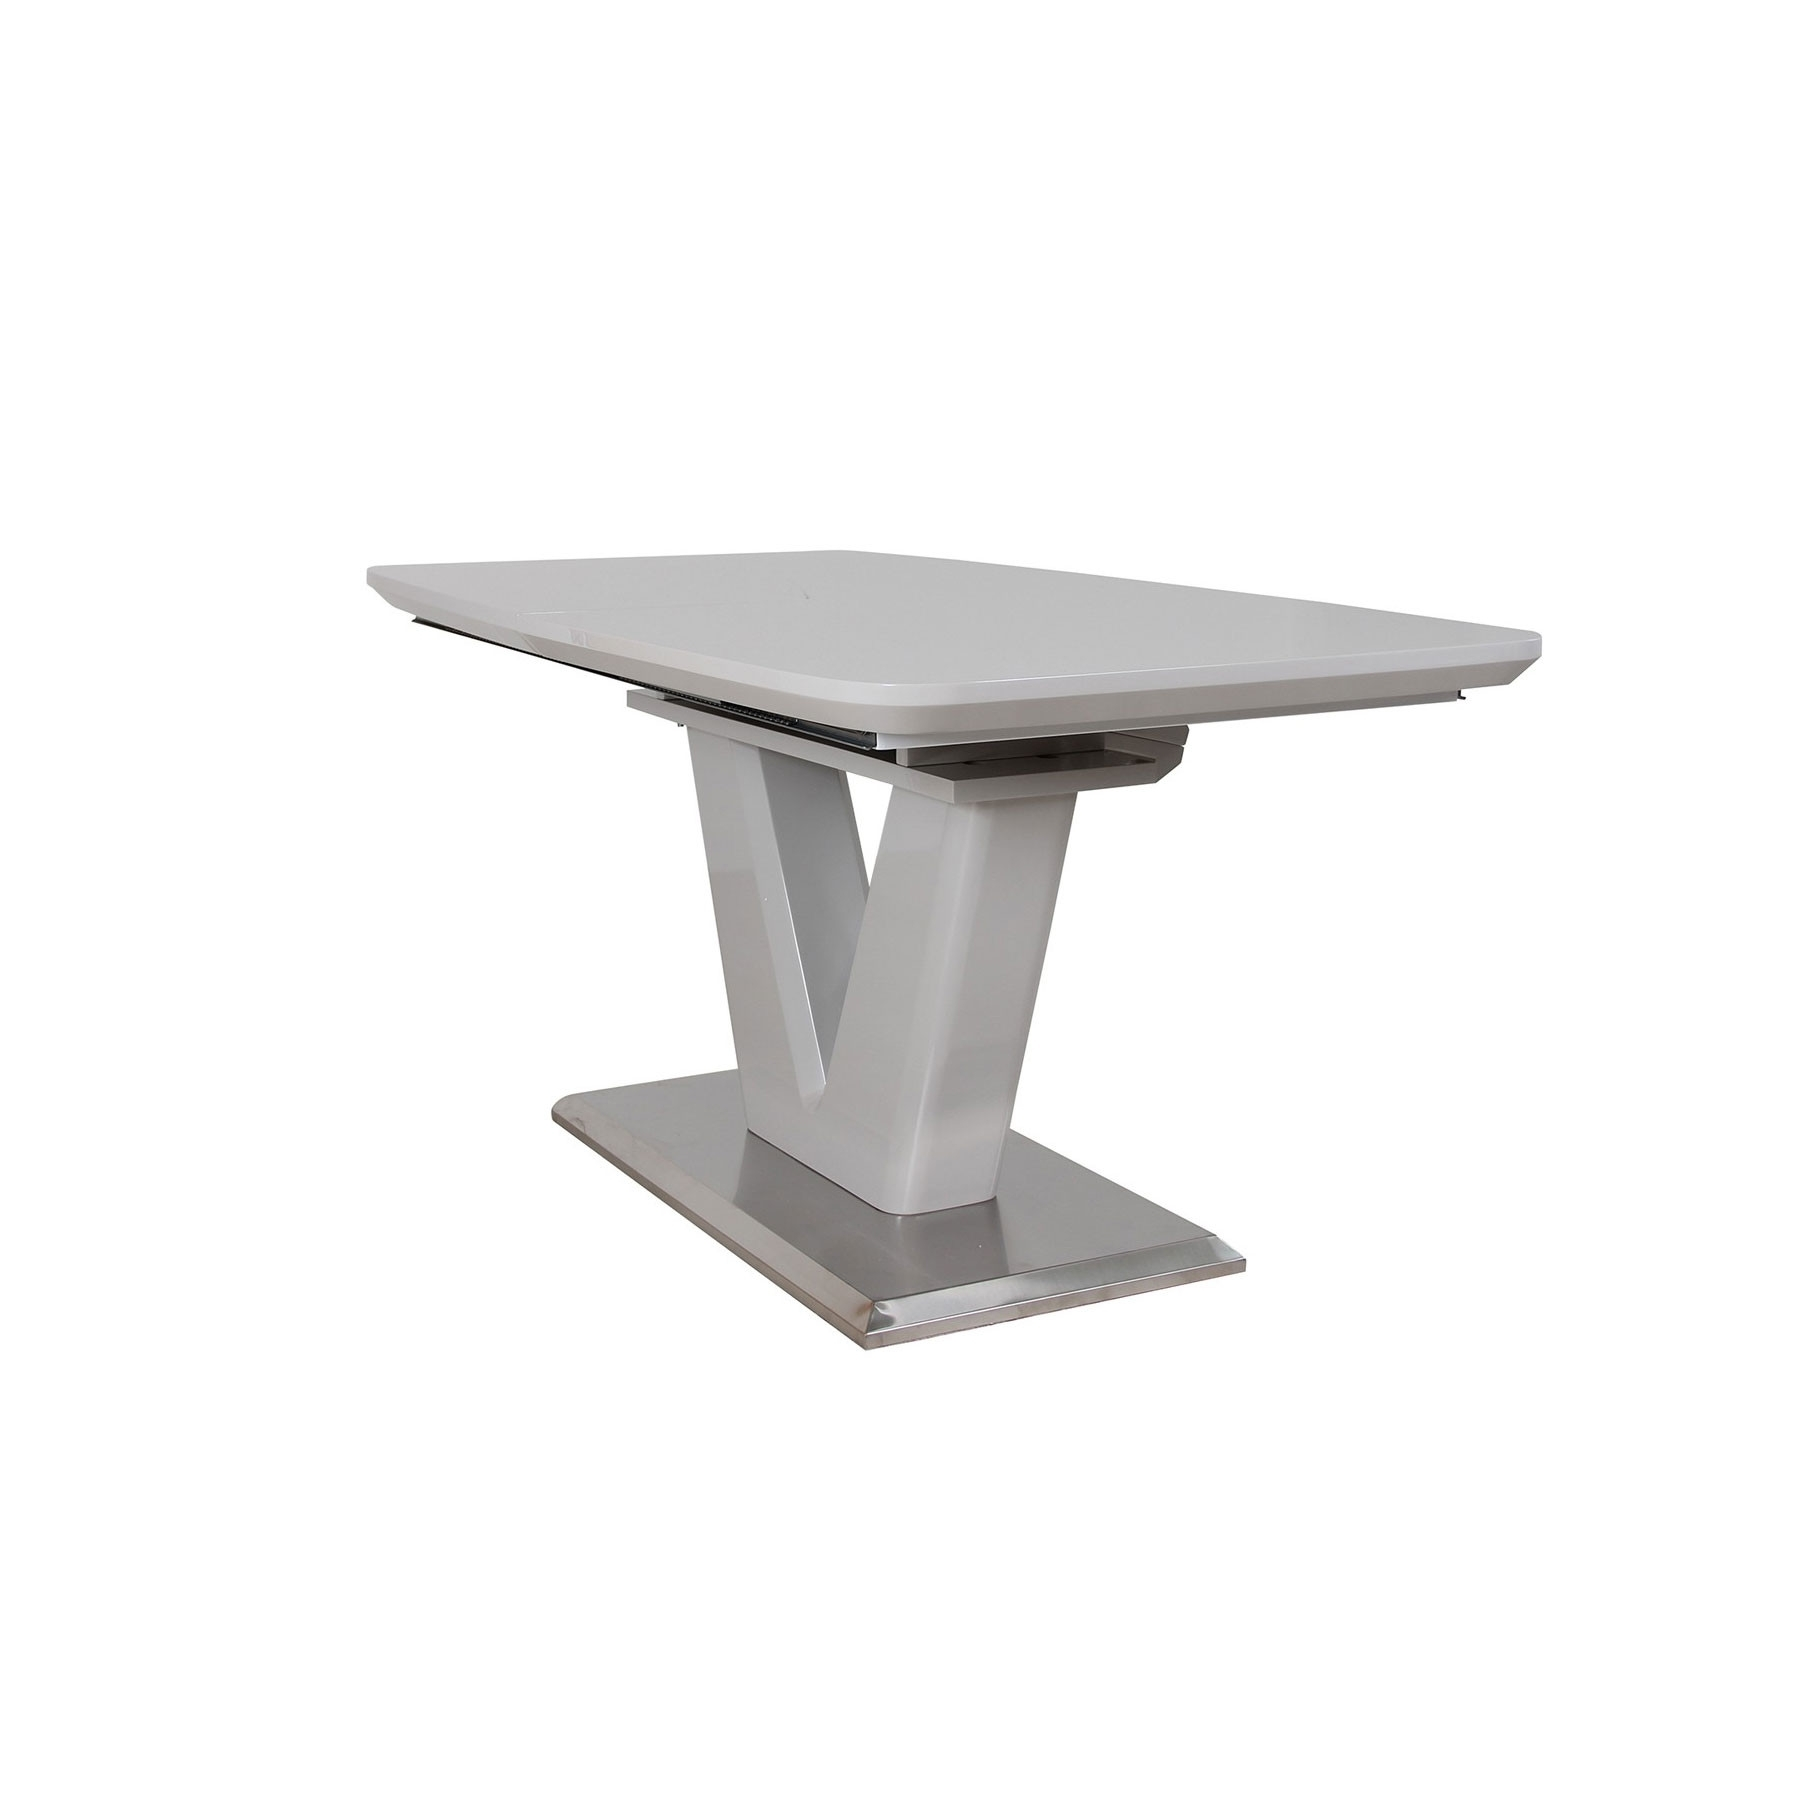 Fashionable Vigo Light Grey High Gloss 220Cm Extending Dining Table With High Gloss Extending Dining Tables (View 10 of 25)